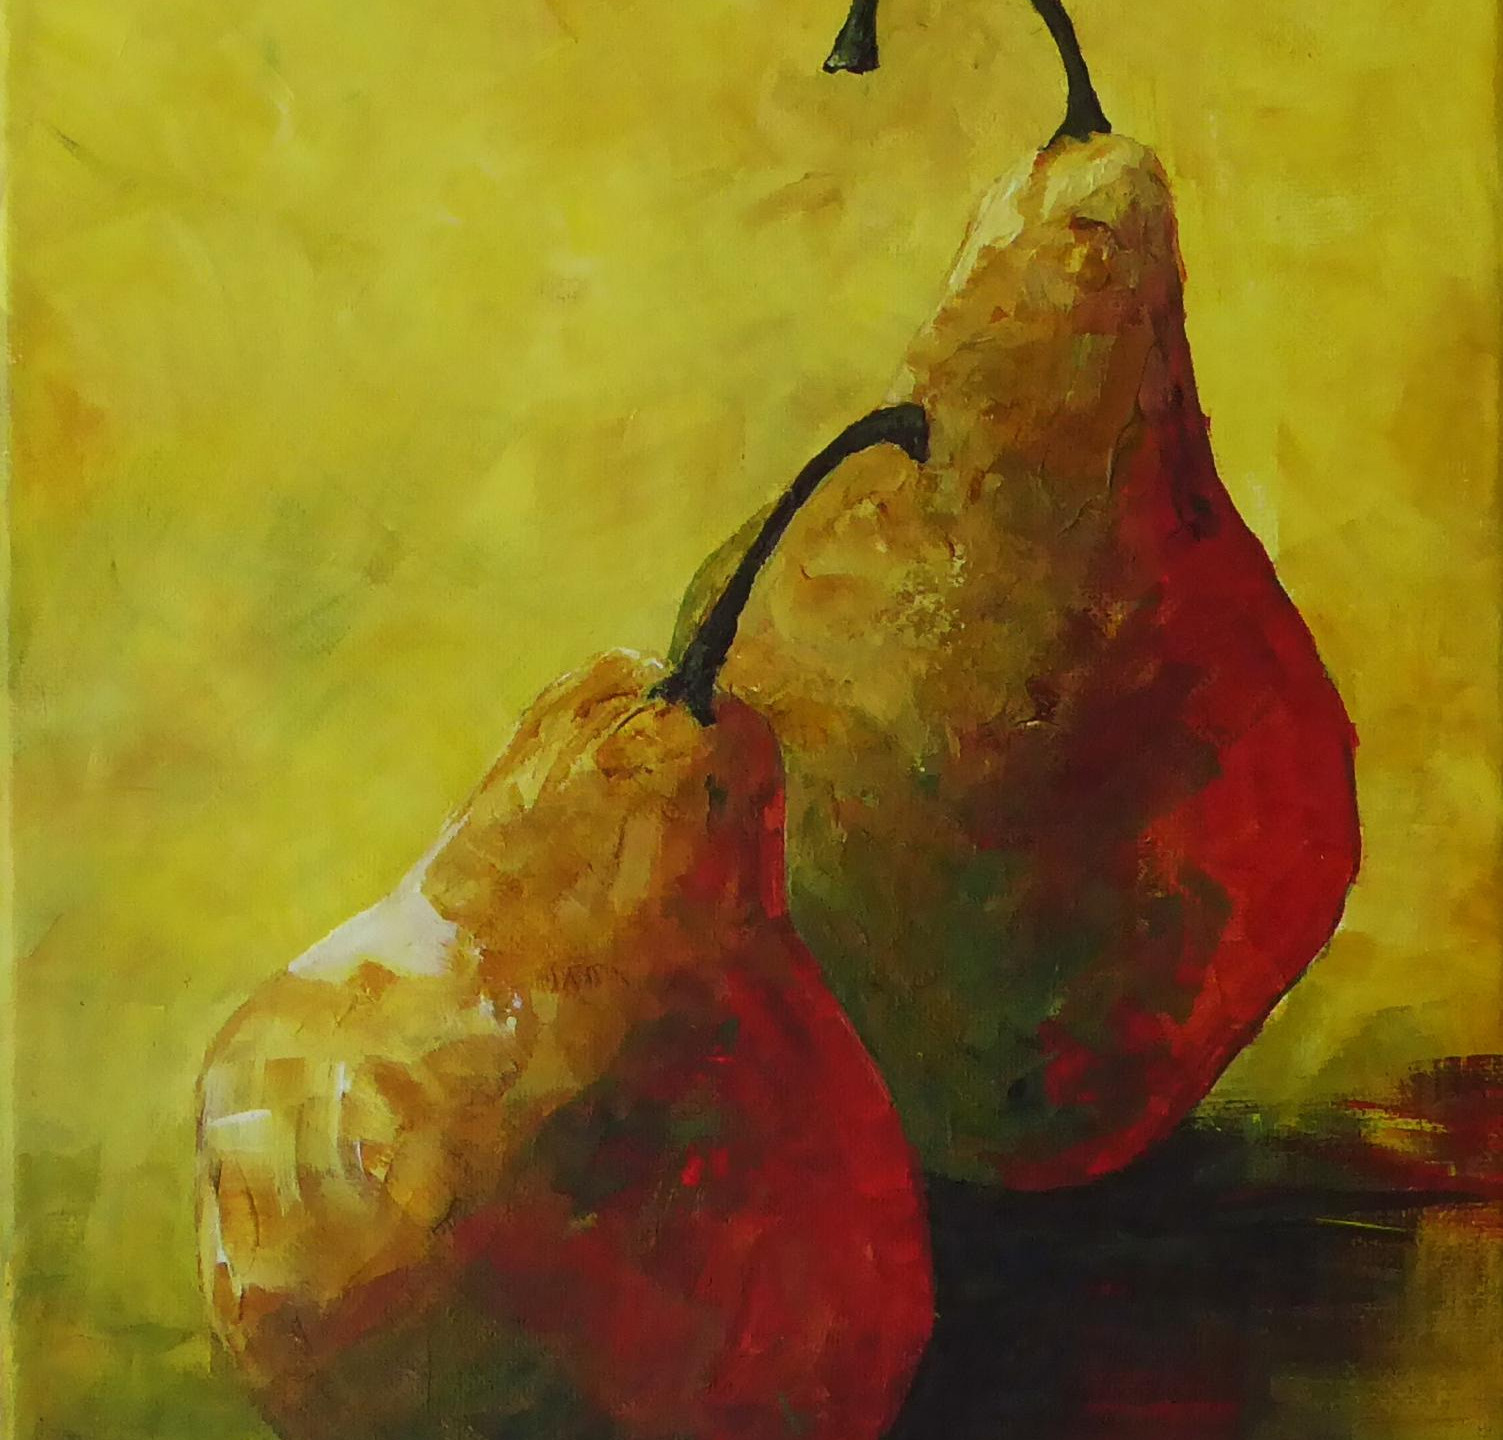 Revell, Jo-Anne - Pair of Pears